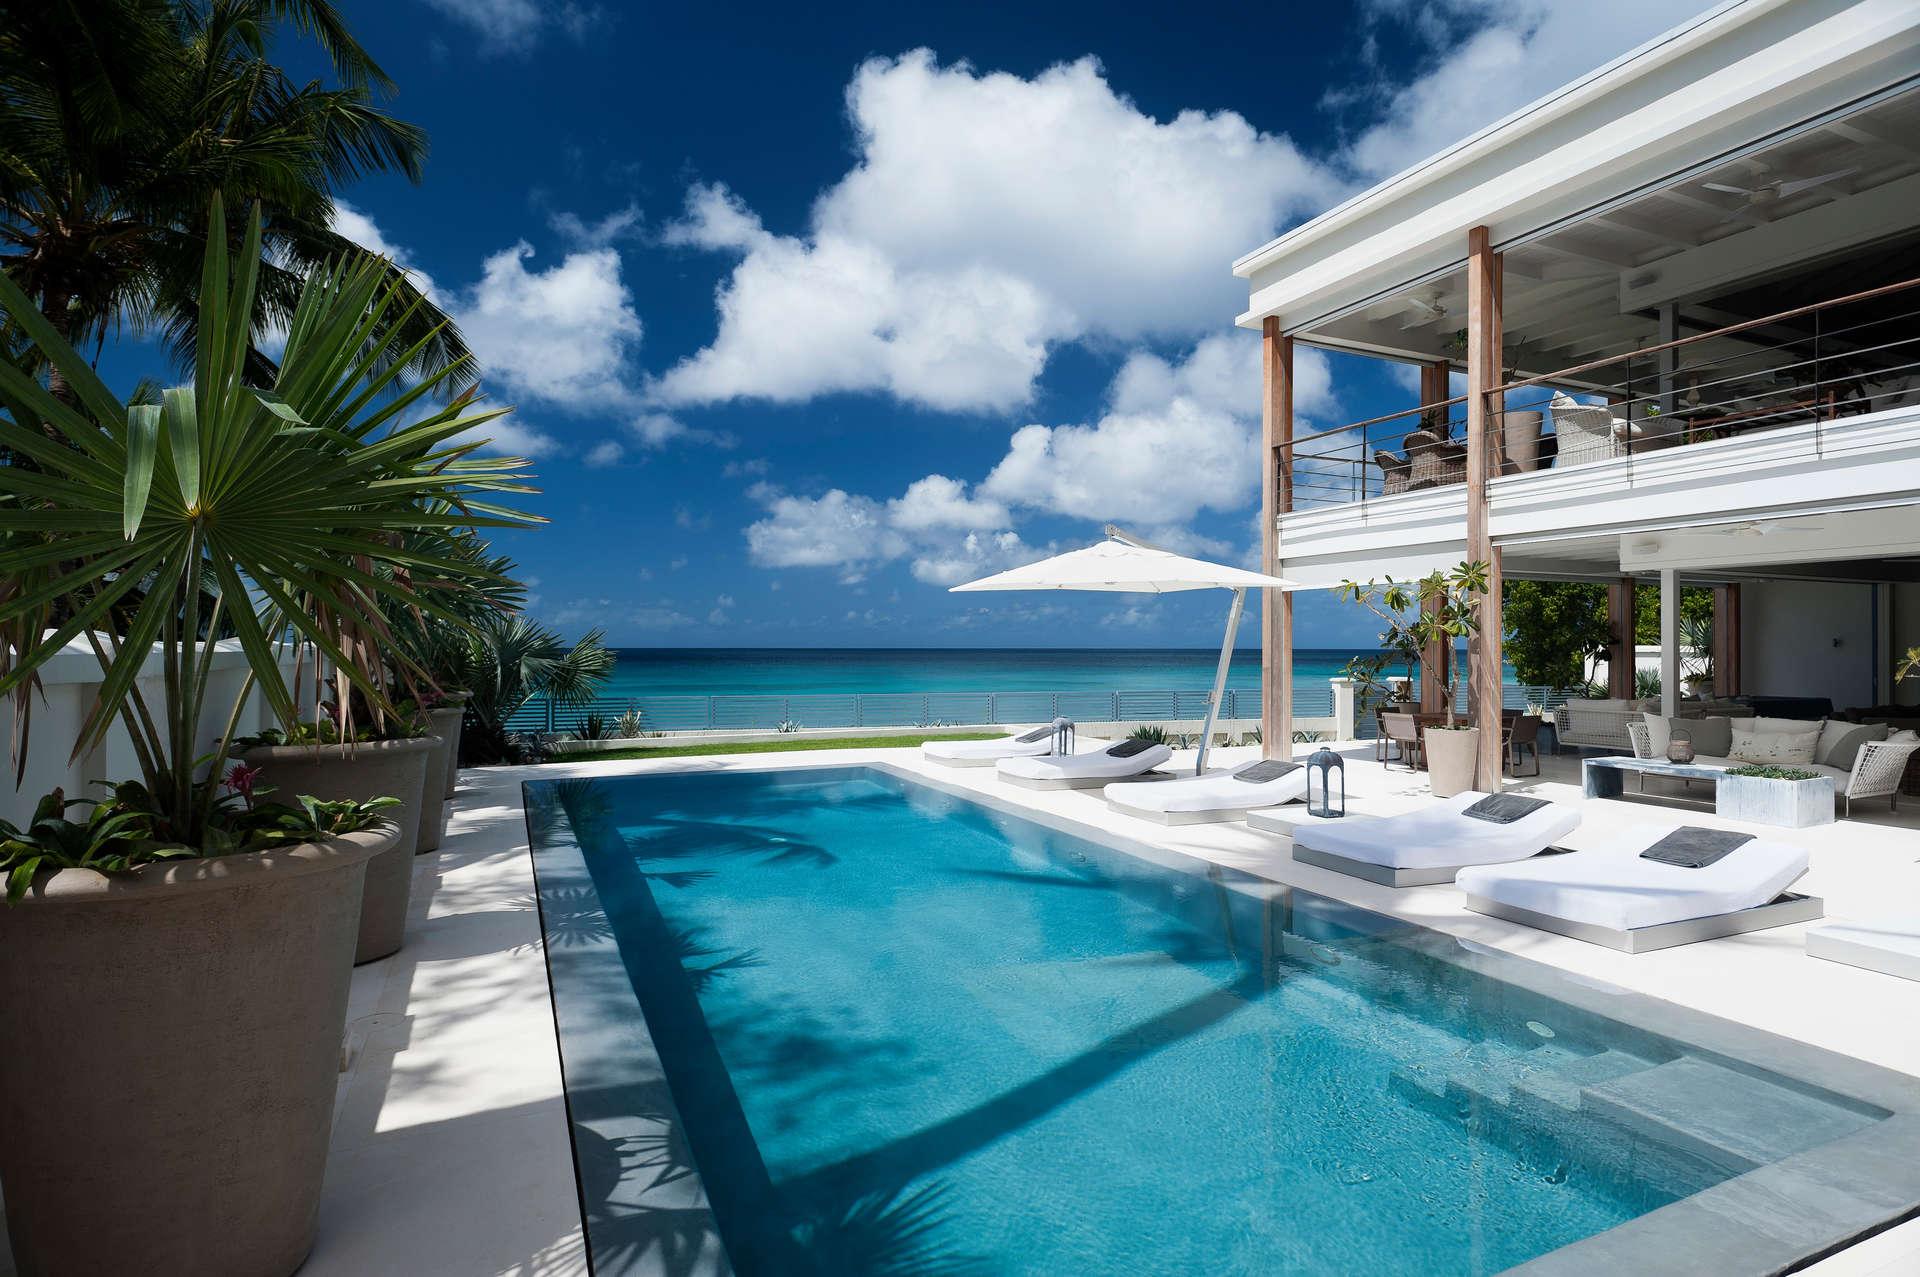 Luxury villa rentals caribbean - Barbados - St james - The garden - The Dream - Image 1/16